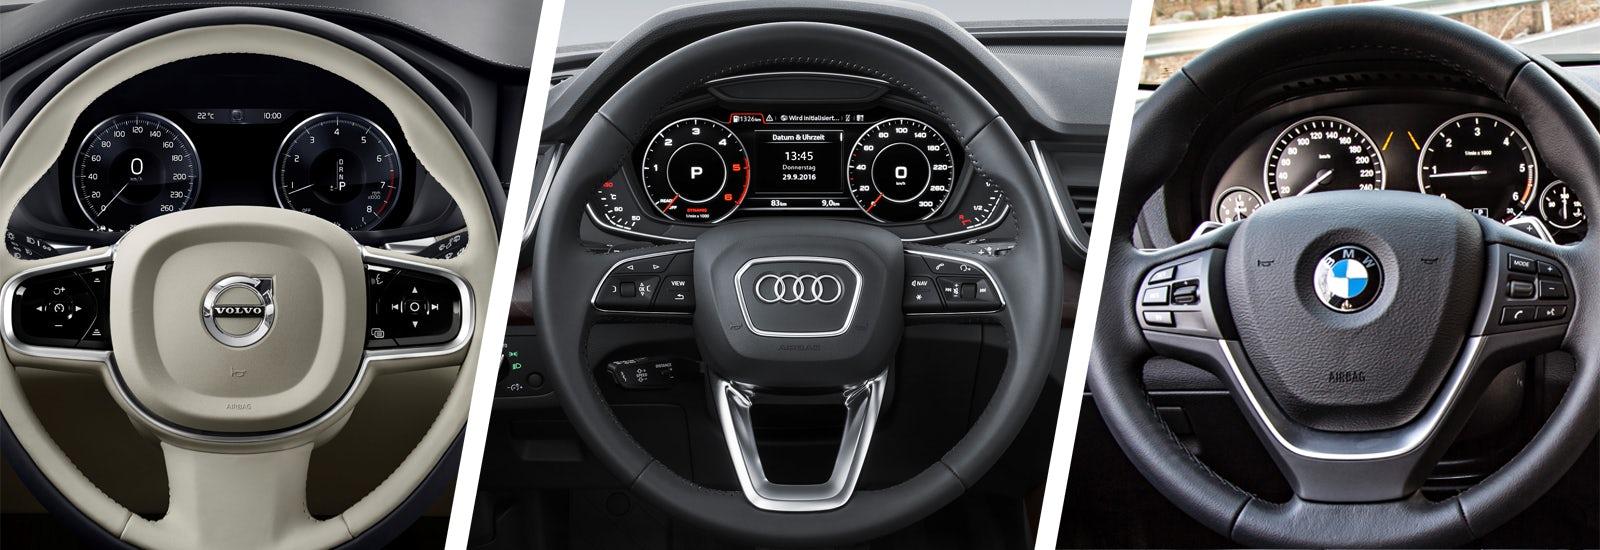 Volvo XC Vs Audi Q Vs BMW X SUV Comparison Carwow - Audi vs bmw